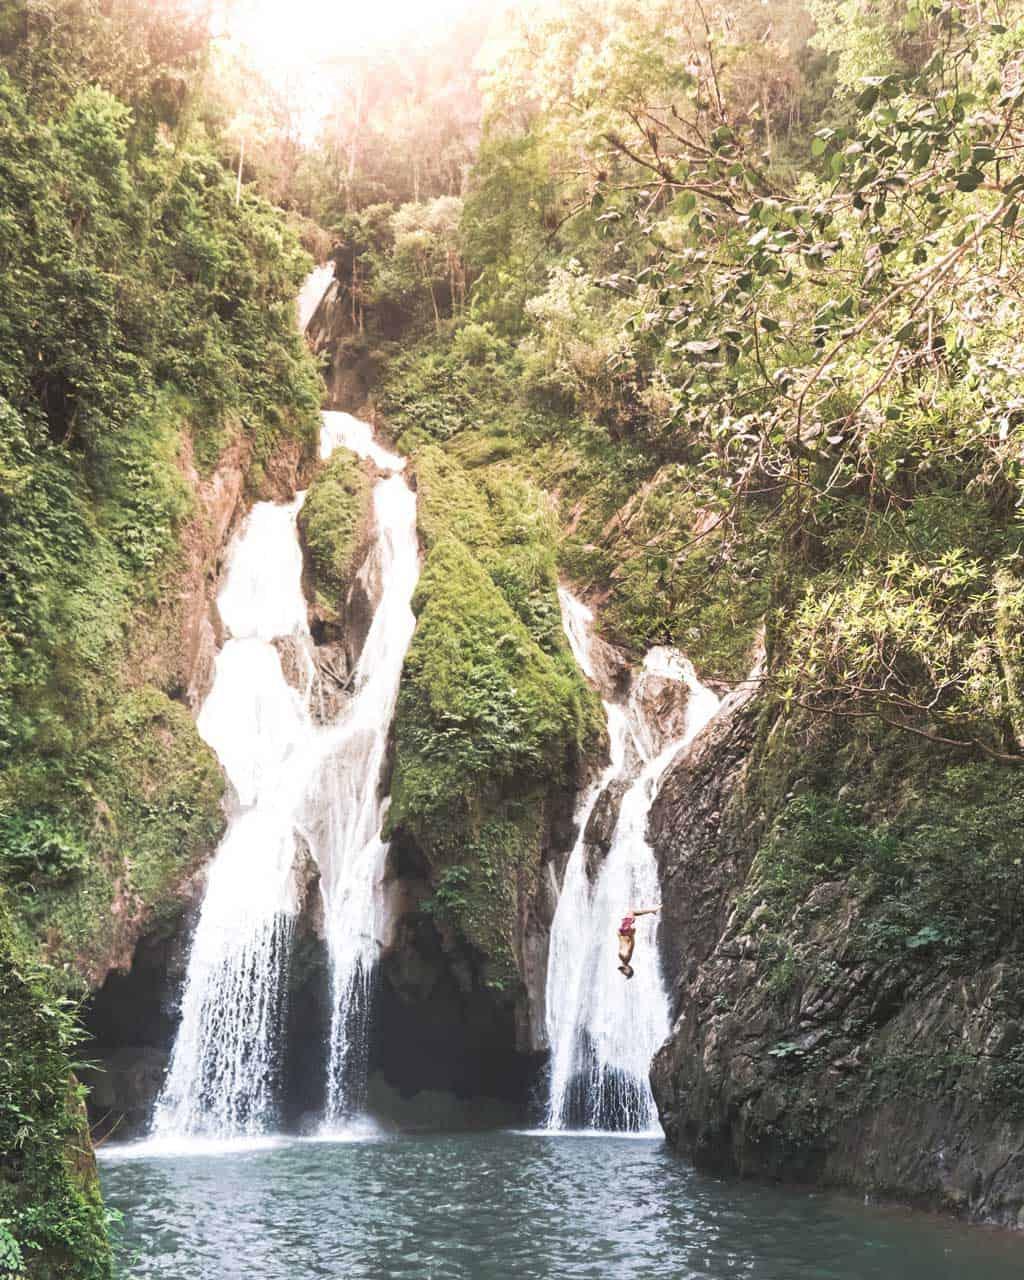 trinidad topes de collantes chutes eau cuba autrement 2